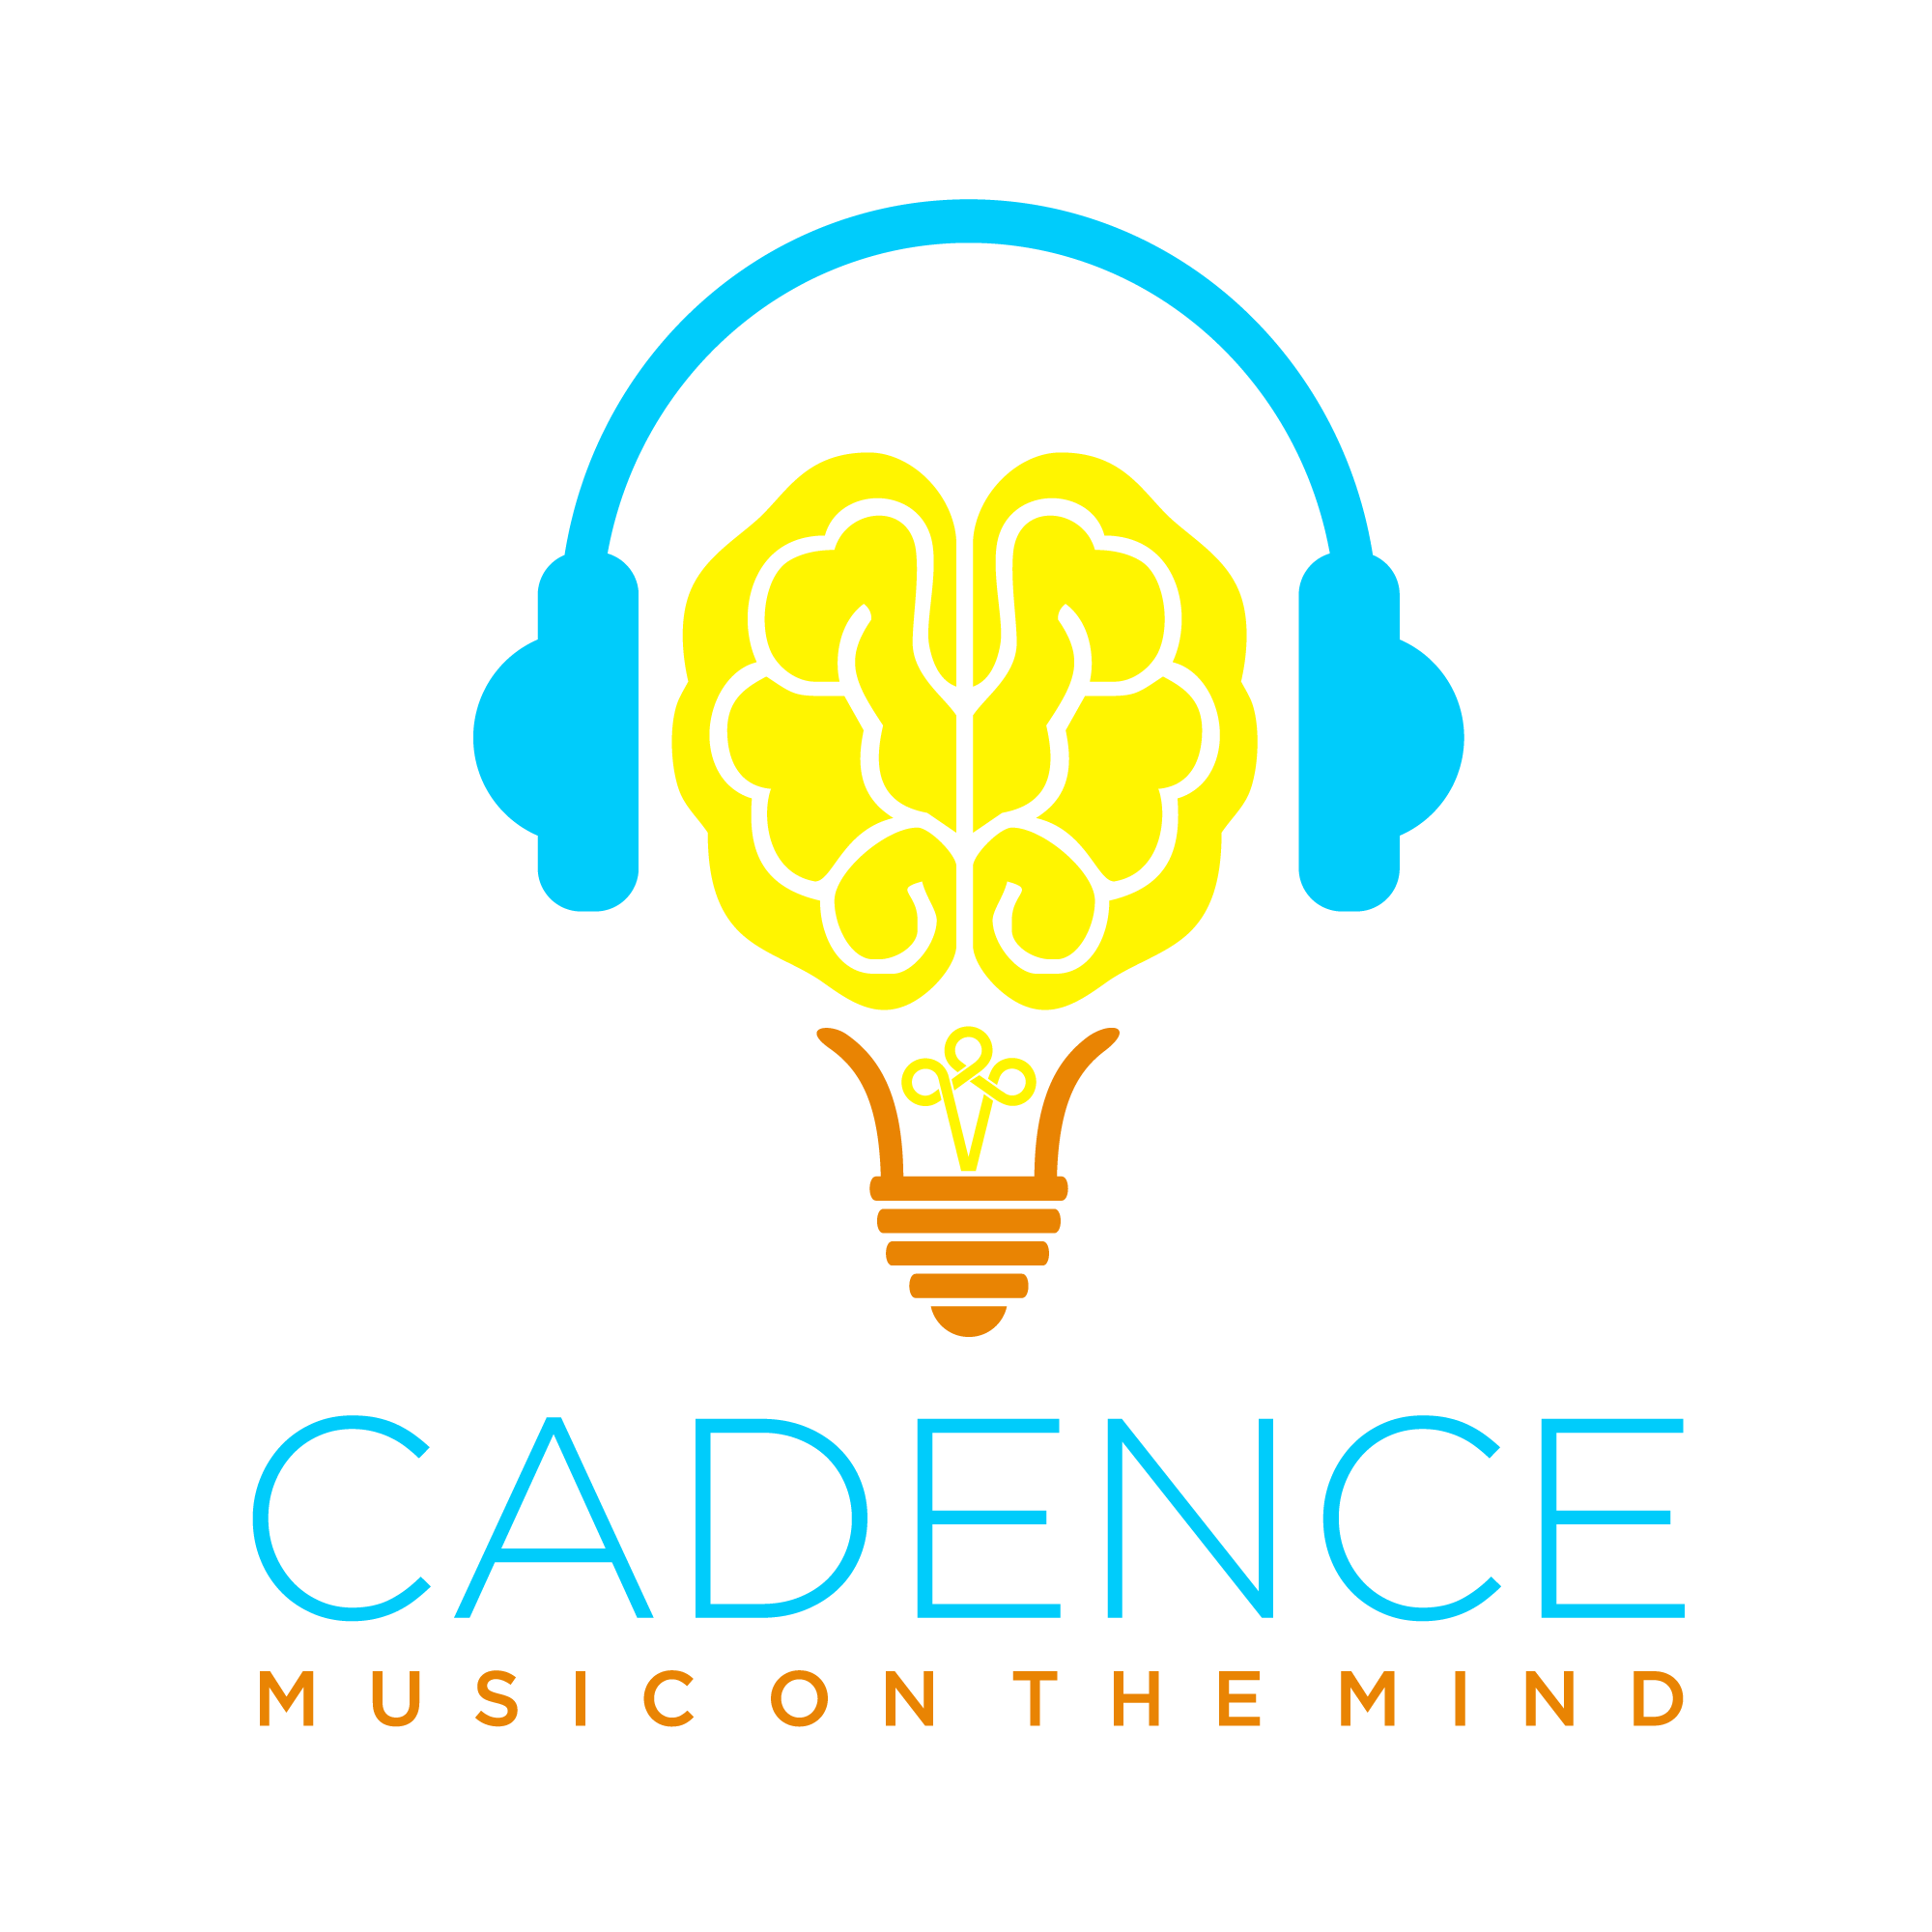 S02 Episode 01: Losing Genes but Gaining Music